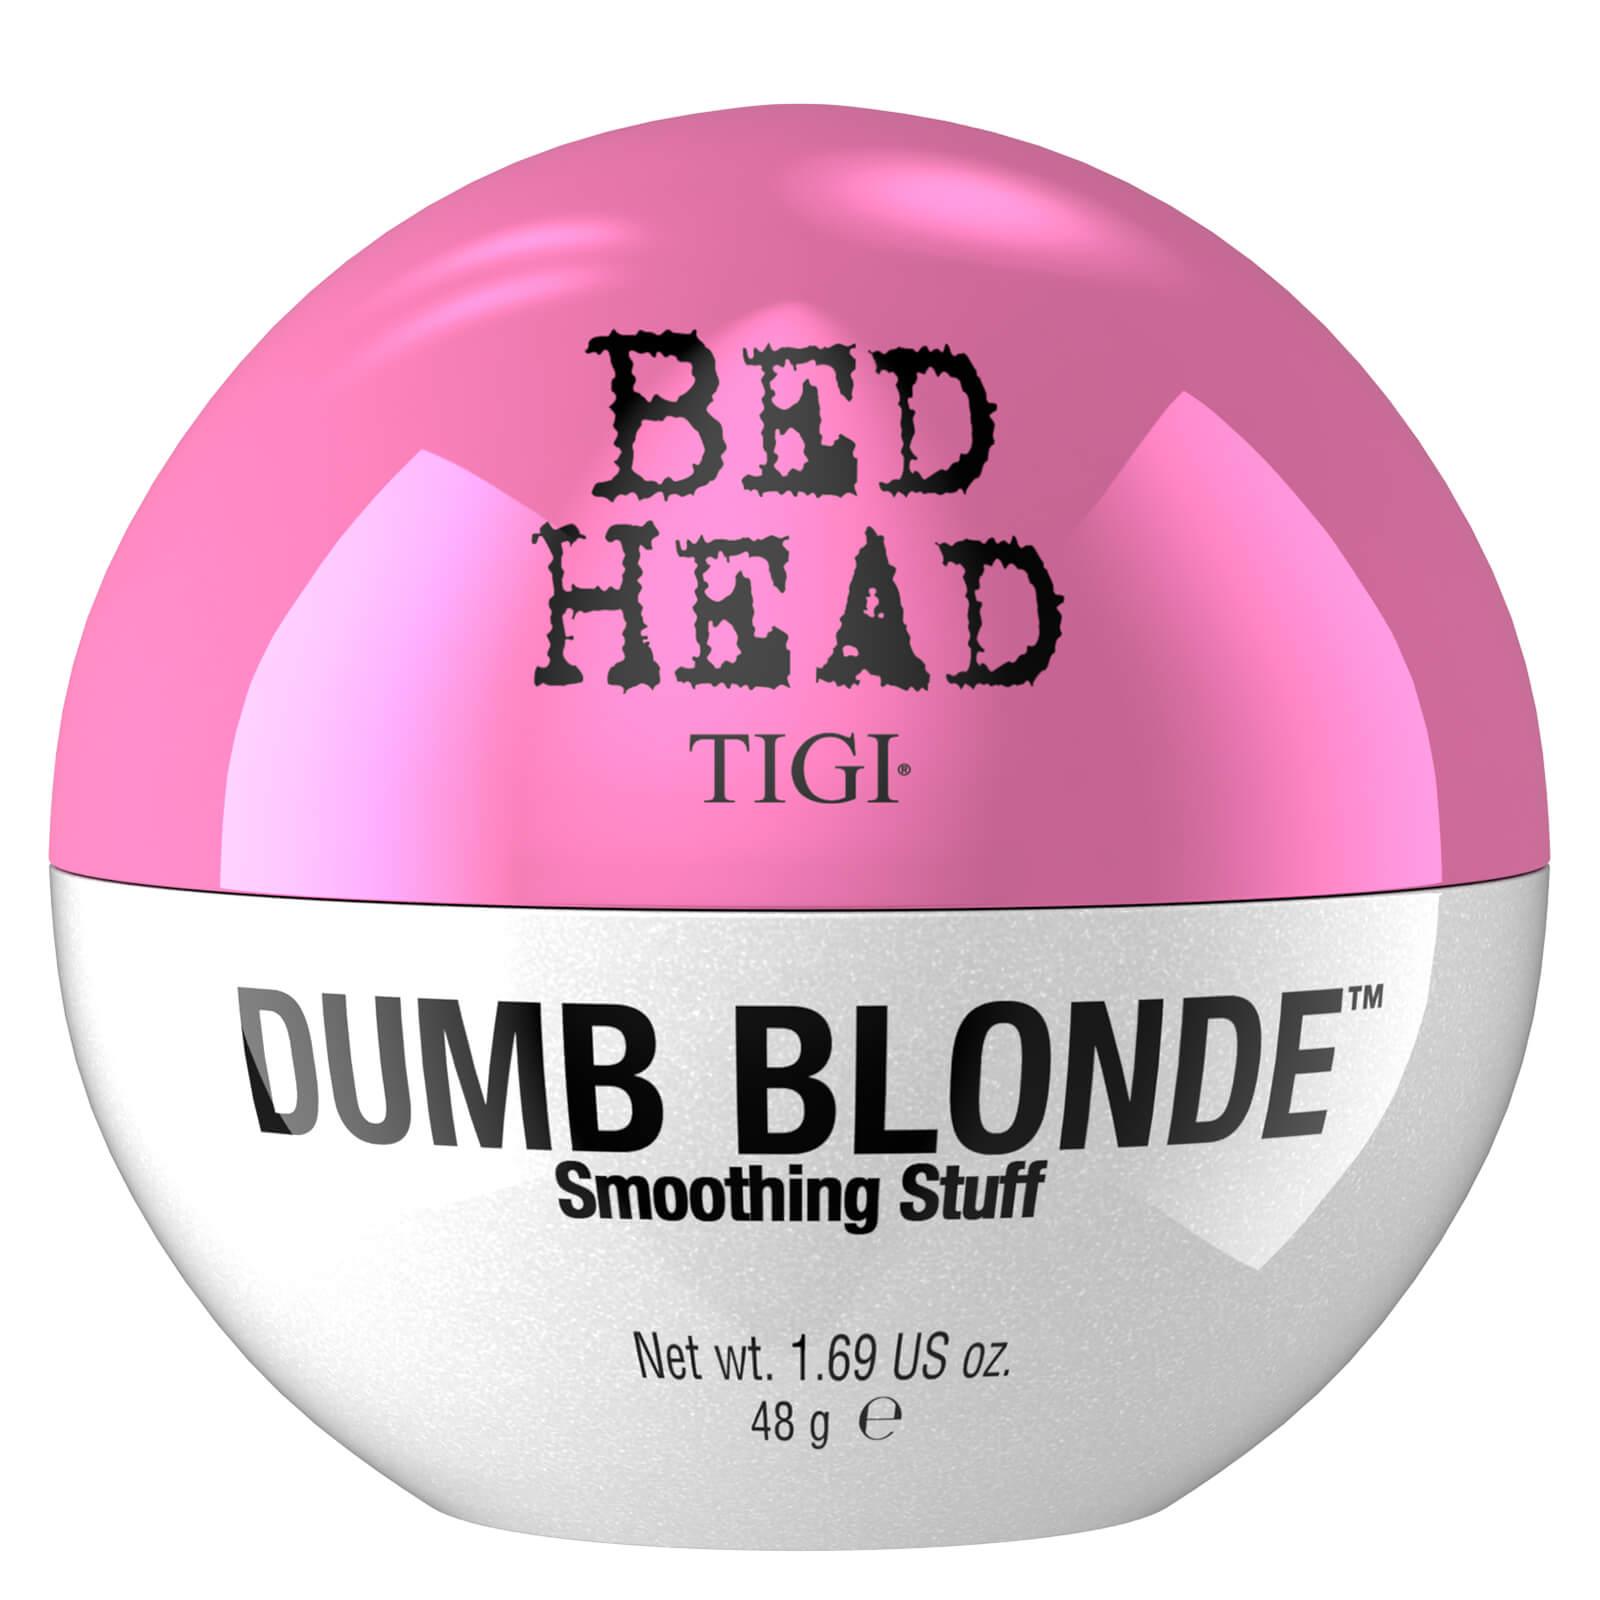 Tigi Bed Head Dumb Blonde Smoothing Stuff (48g)